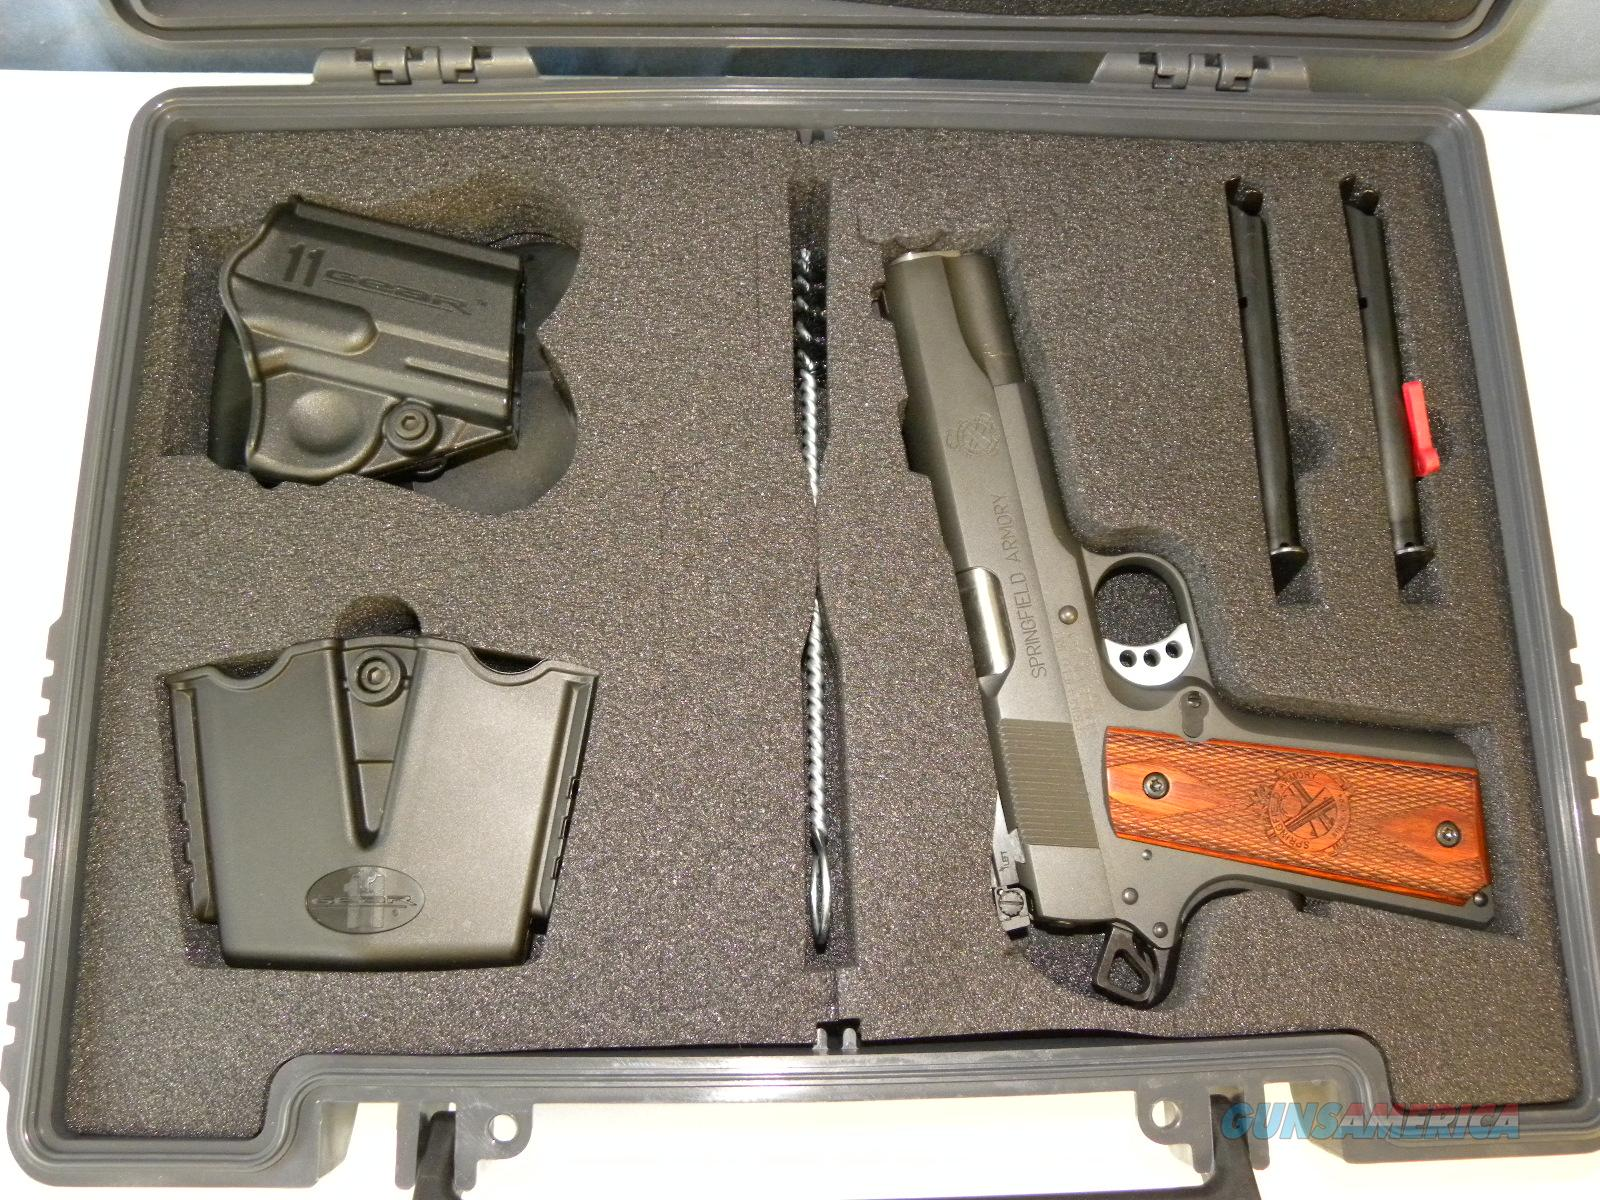 Springfield 1911 Range Officer  Guns > Pistols > Springfield Armory Pistols > 1911 Type